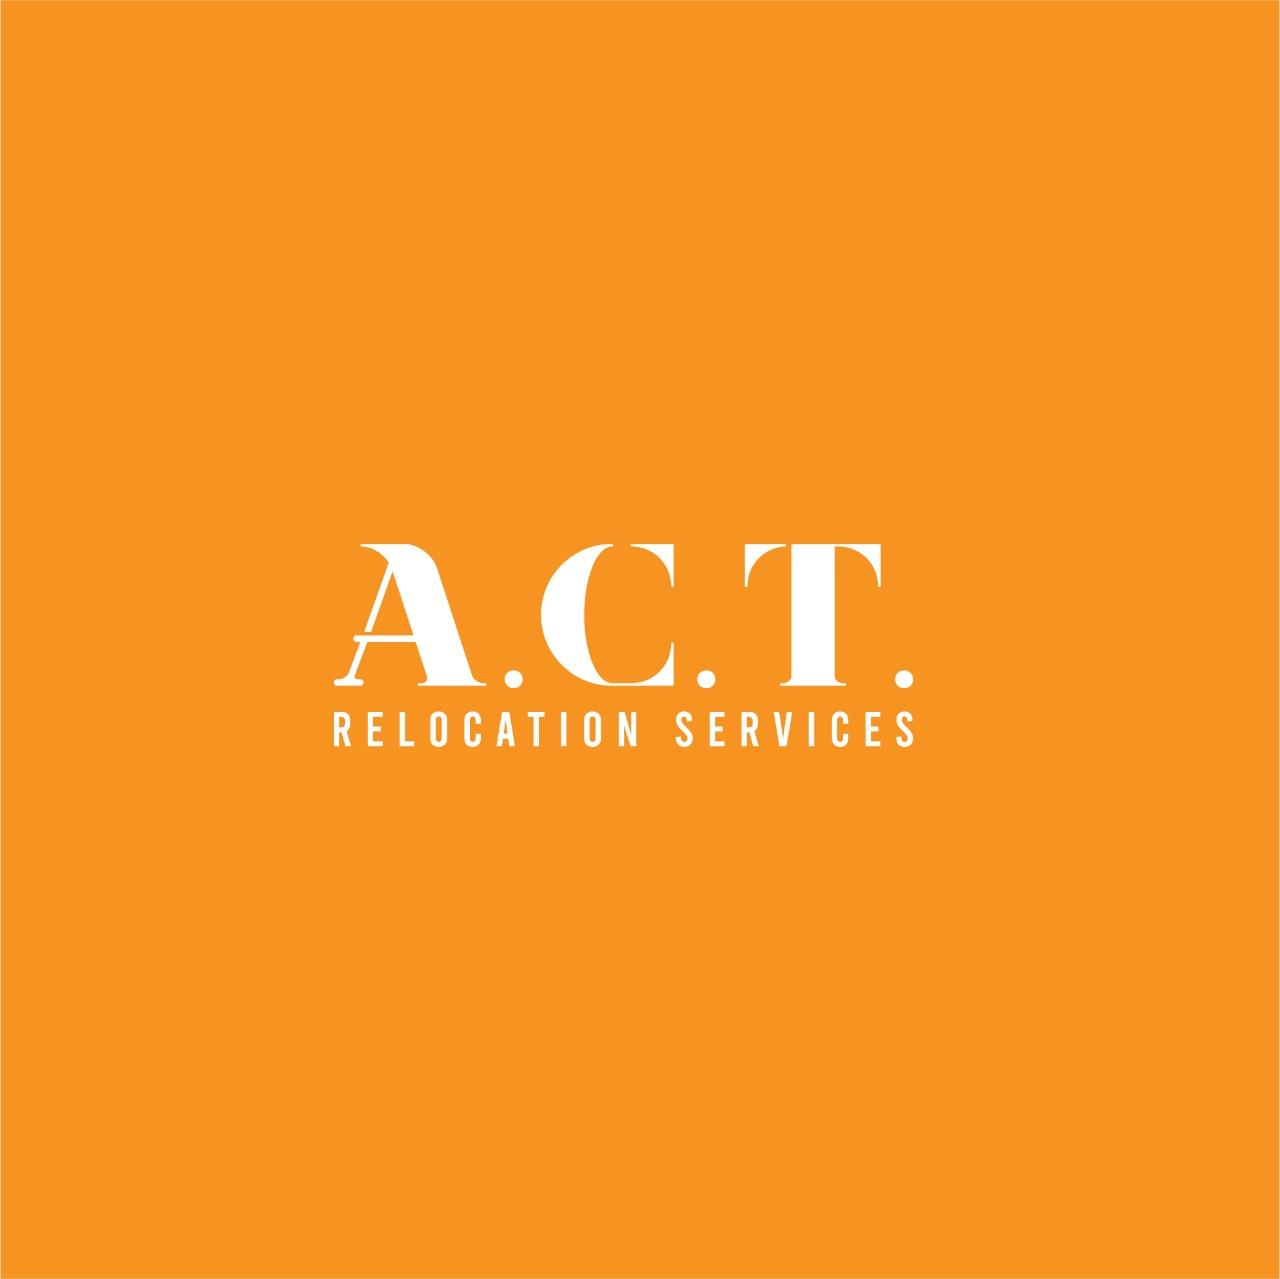 Reubicación ACT Relocation Services